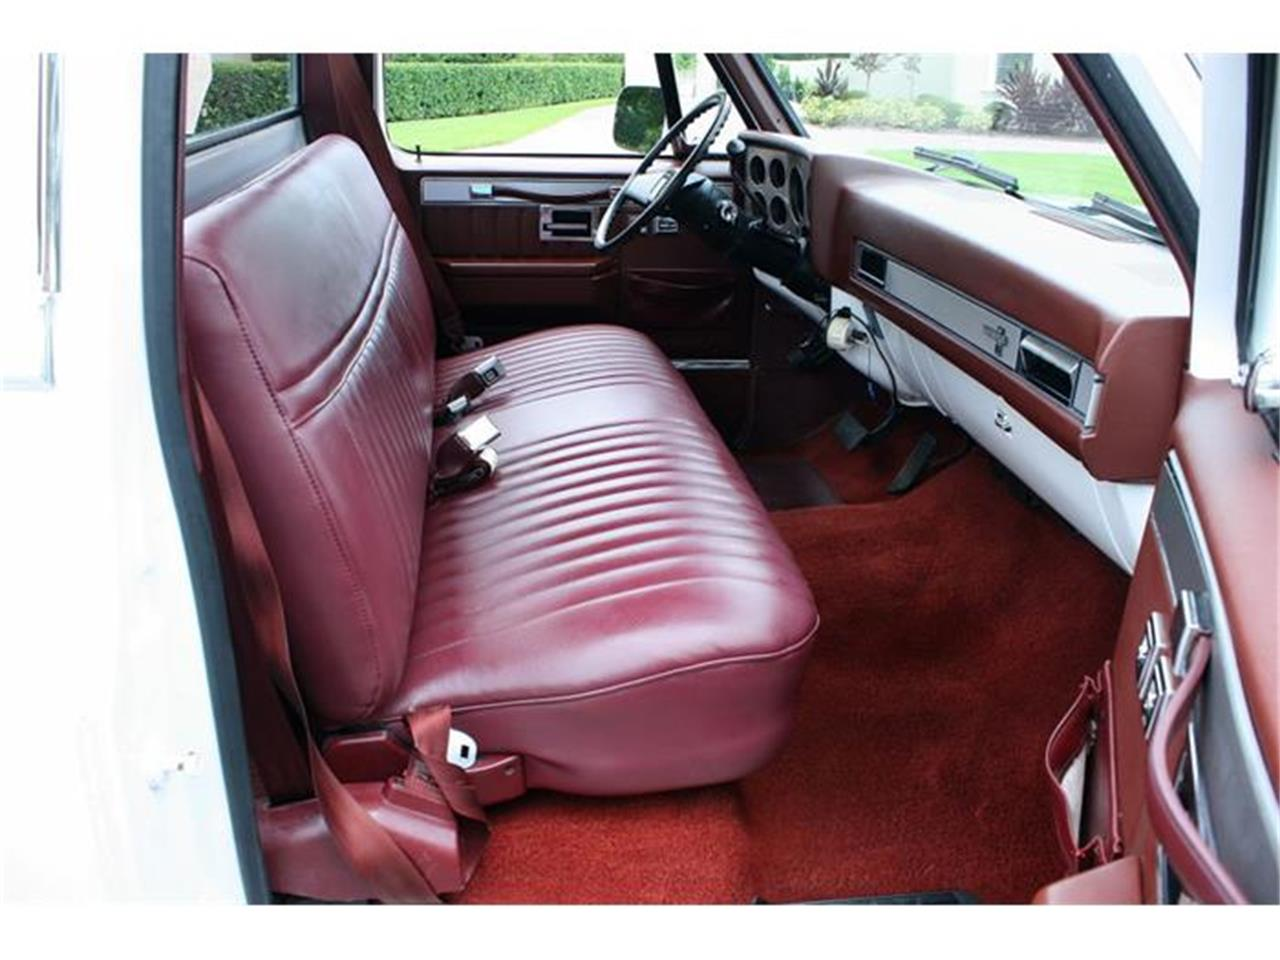 Large Picture of '87 Silverado located in Florida - $19,500.00 - IQHJ